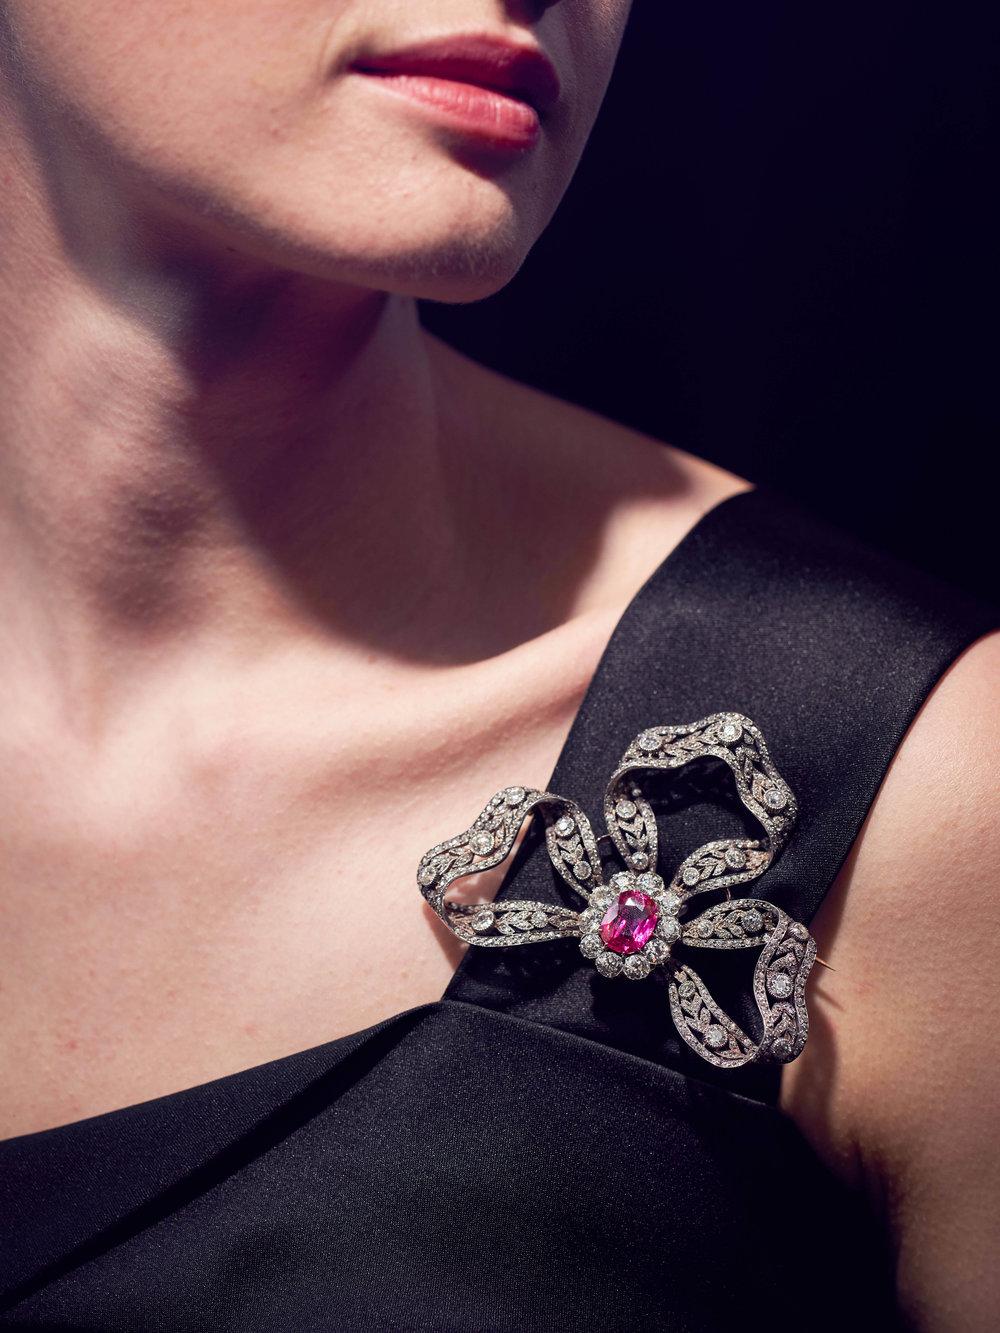 A diamond bow brooch adorned with a 6.89-carat Burmese ruby/Estimate: $ 200,000 – 300,000